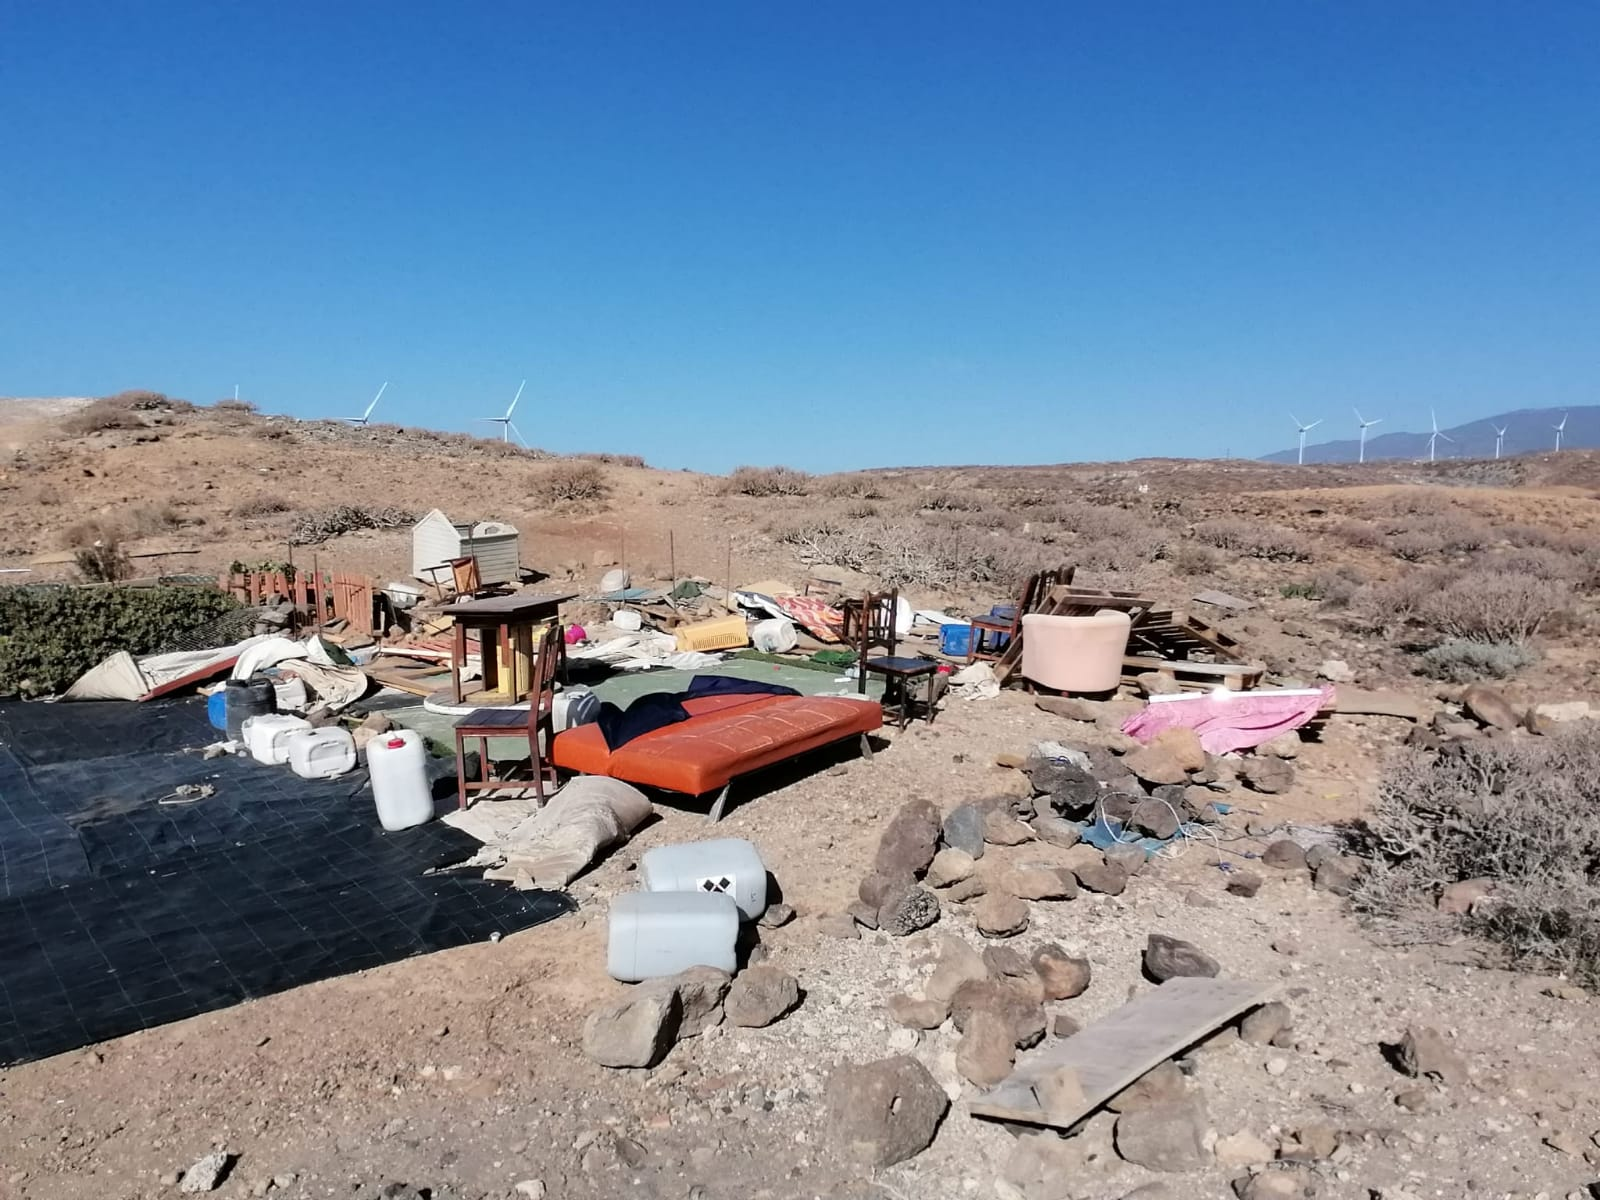 Transición Ecológica abre un expediente sancionador al camping ilegal de Montaña de Abades por vertido de residuos